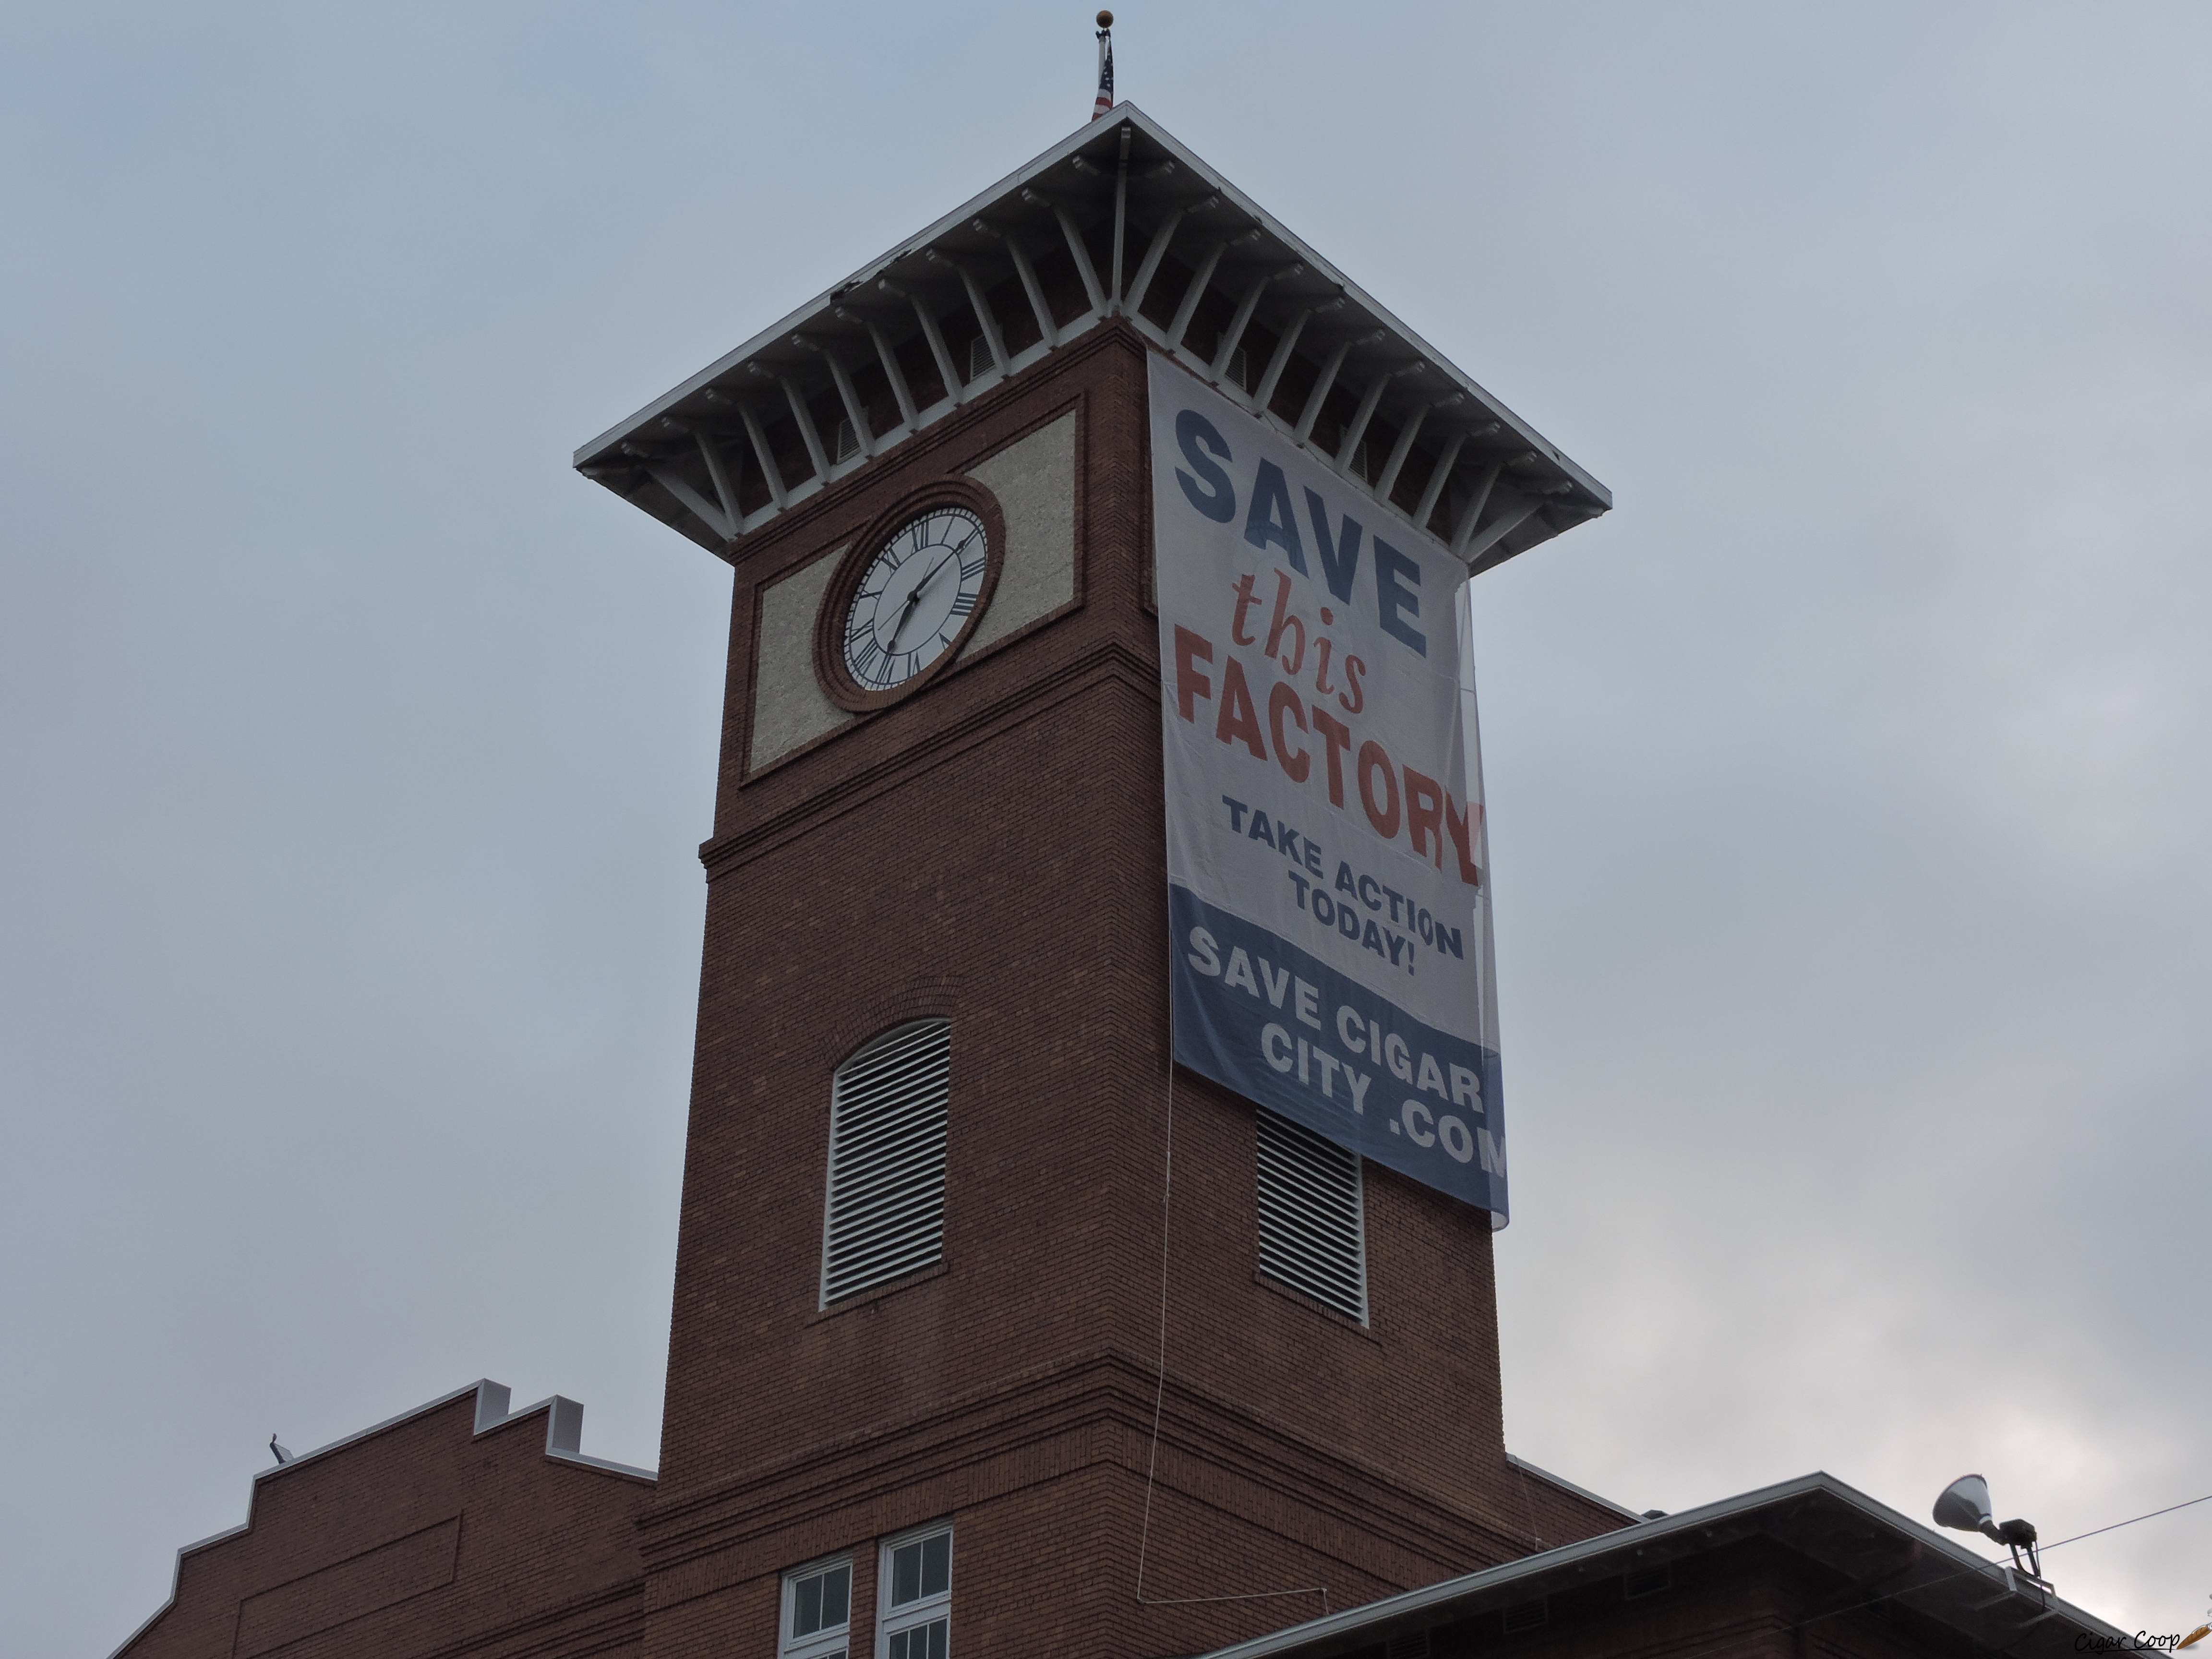 Cigar News: J.C. Newman Relaunches Save Cigar City Campaign